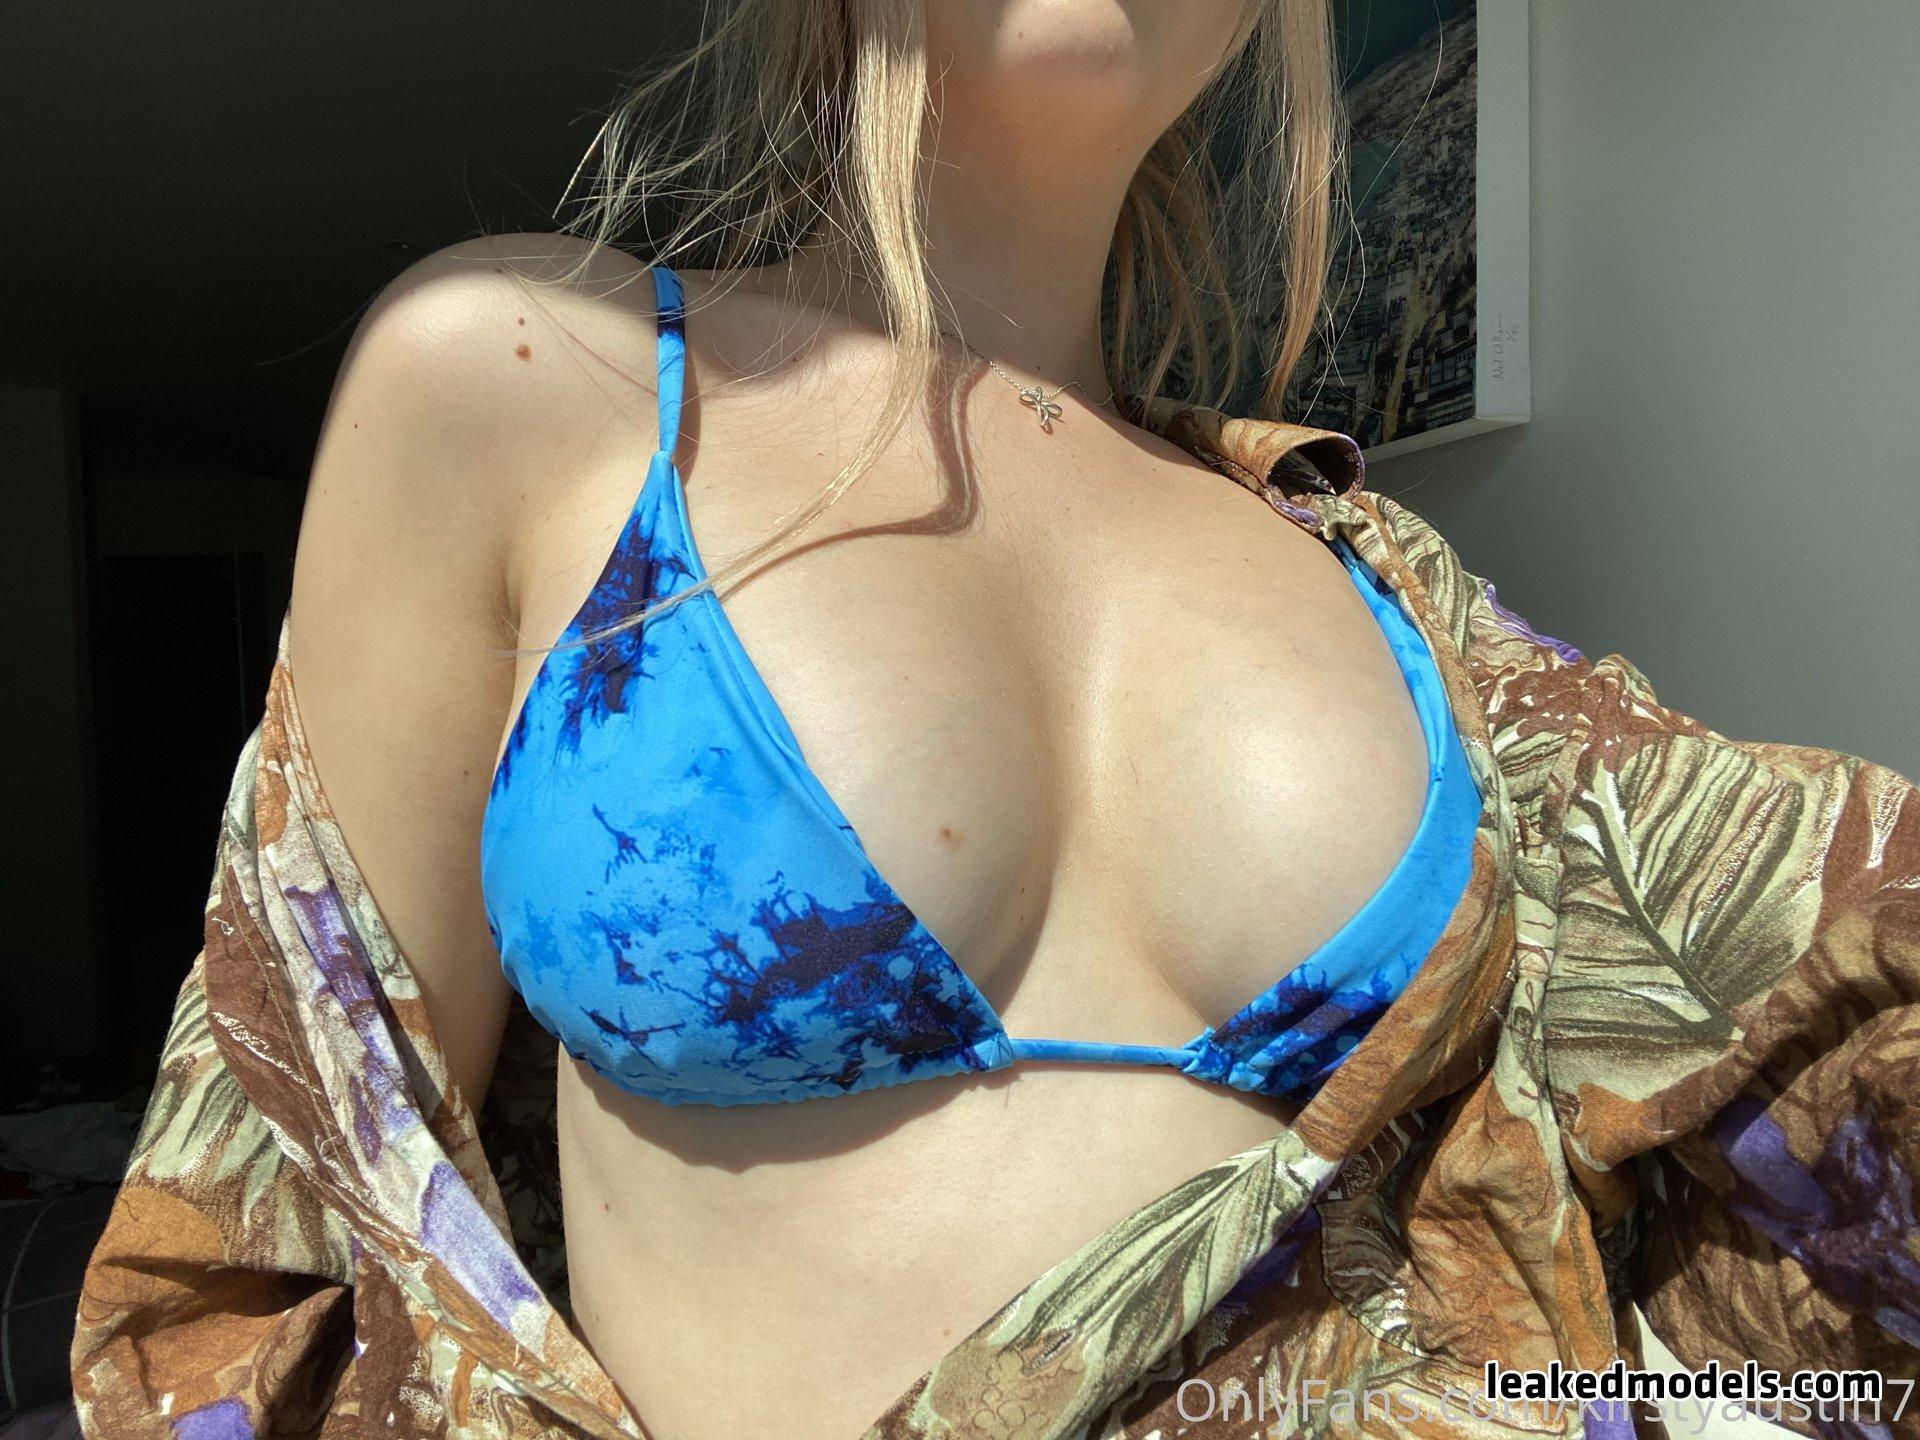 Kirsty Austin – kirstyaustin7 Onlyfans Leaks (48 photos + 4 videos)